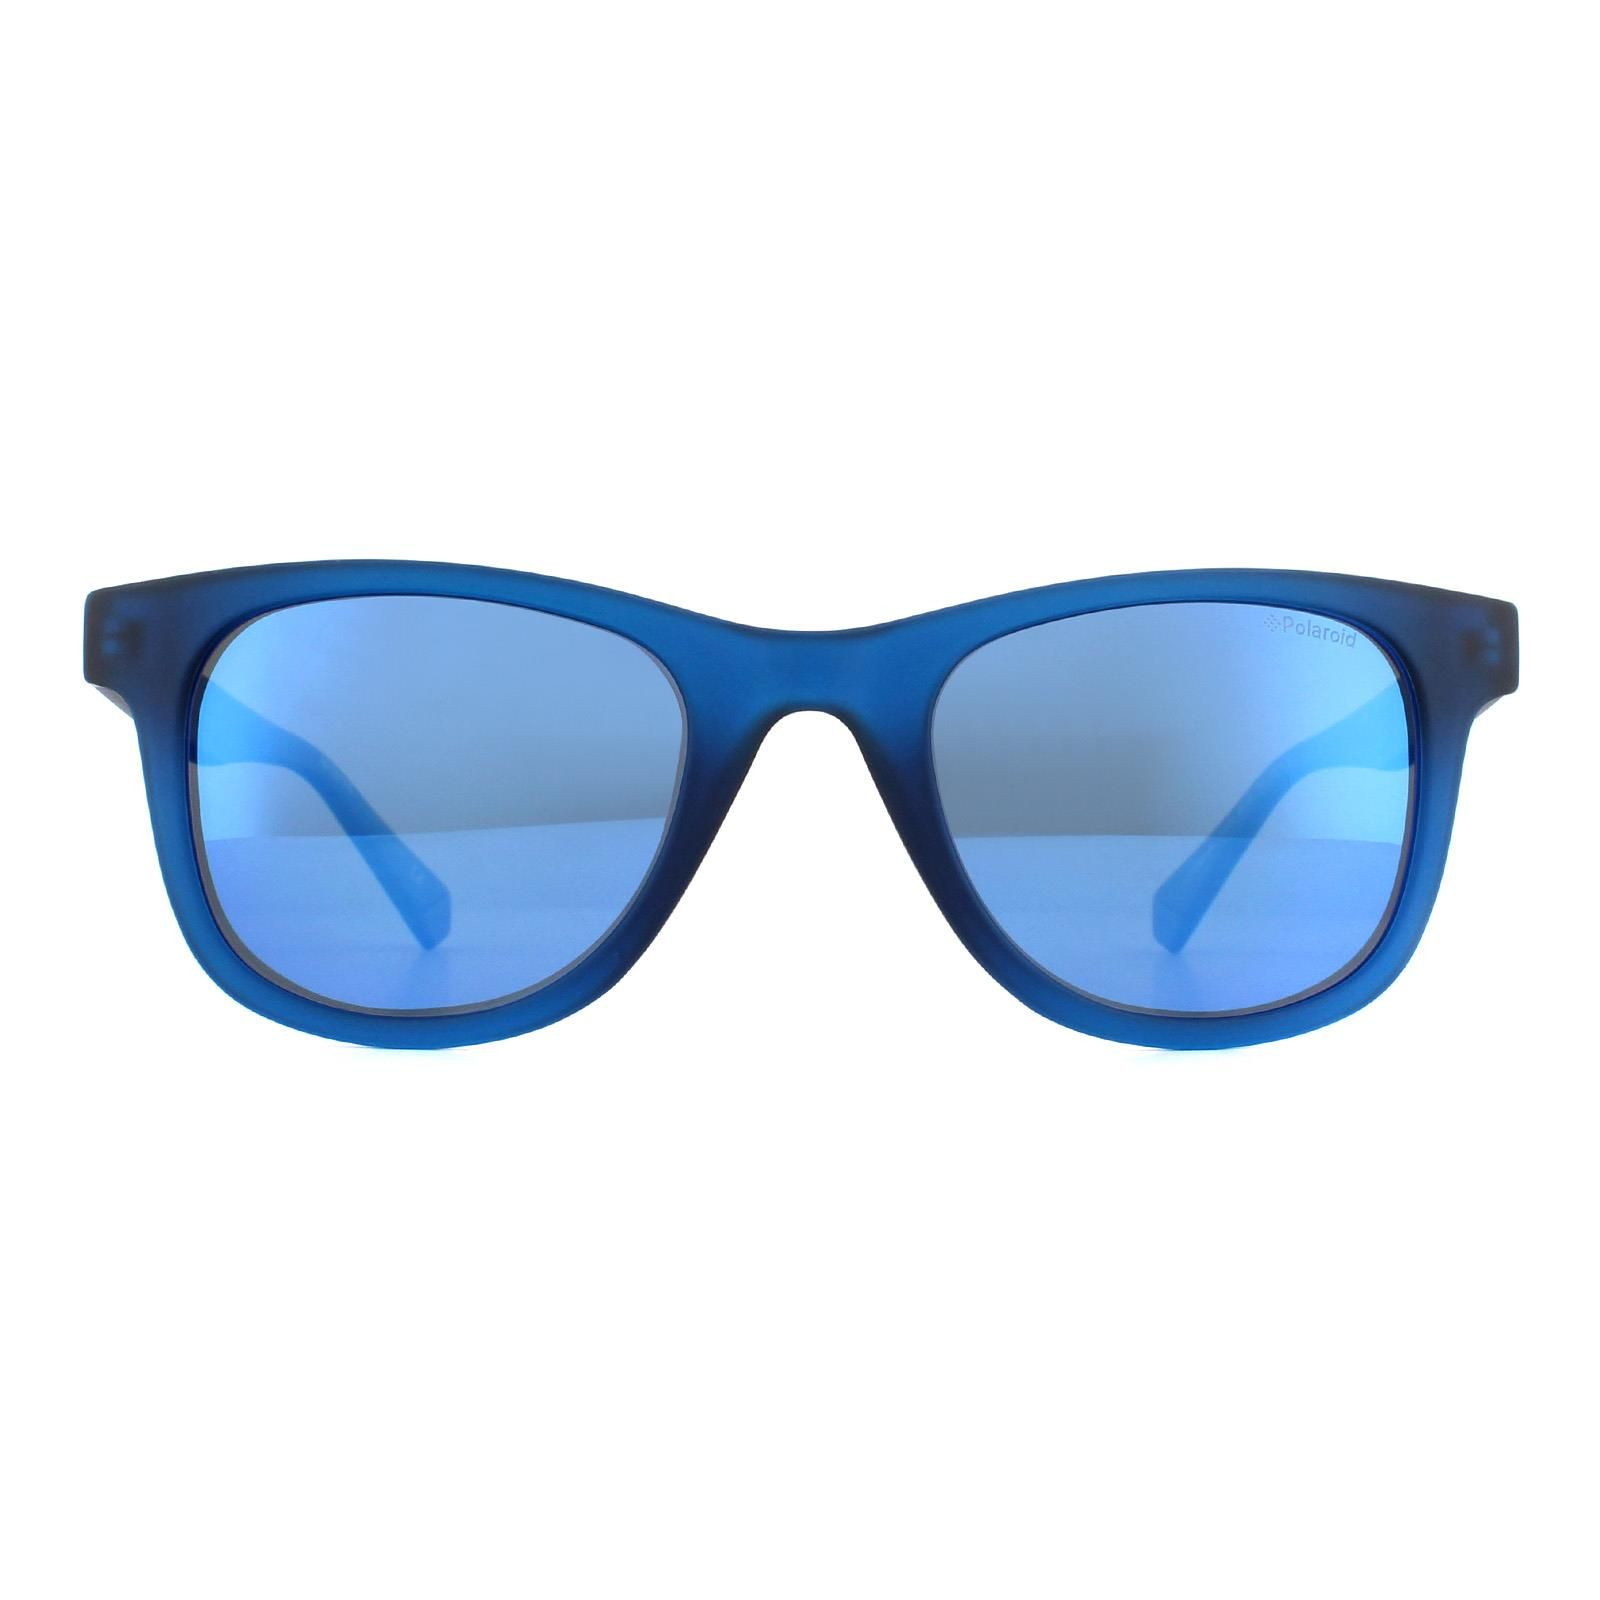 Polaroid Sunglasses PLD 1016/S/NEW PJP 5X Transparent Blue Blue Mirror Polarized